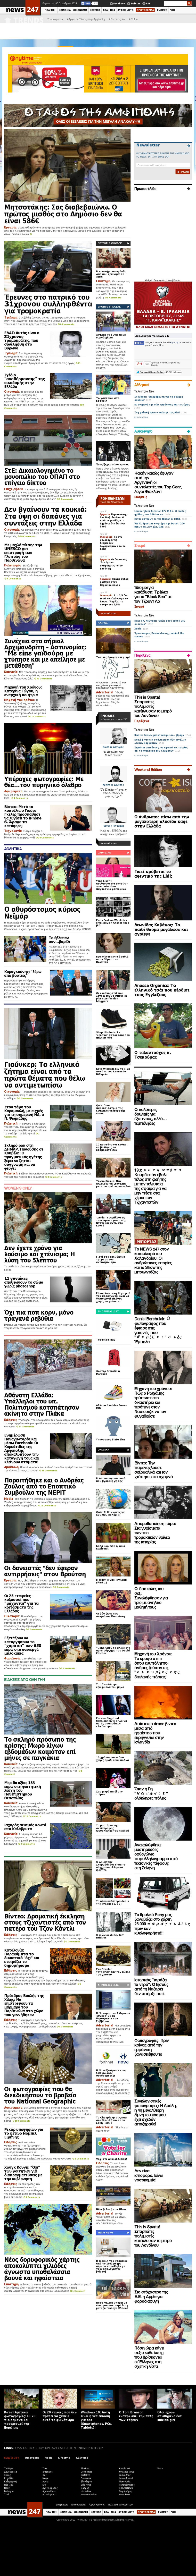 News 247 at Friday Oct. 3, 2014, 8:11 p.m. UTC